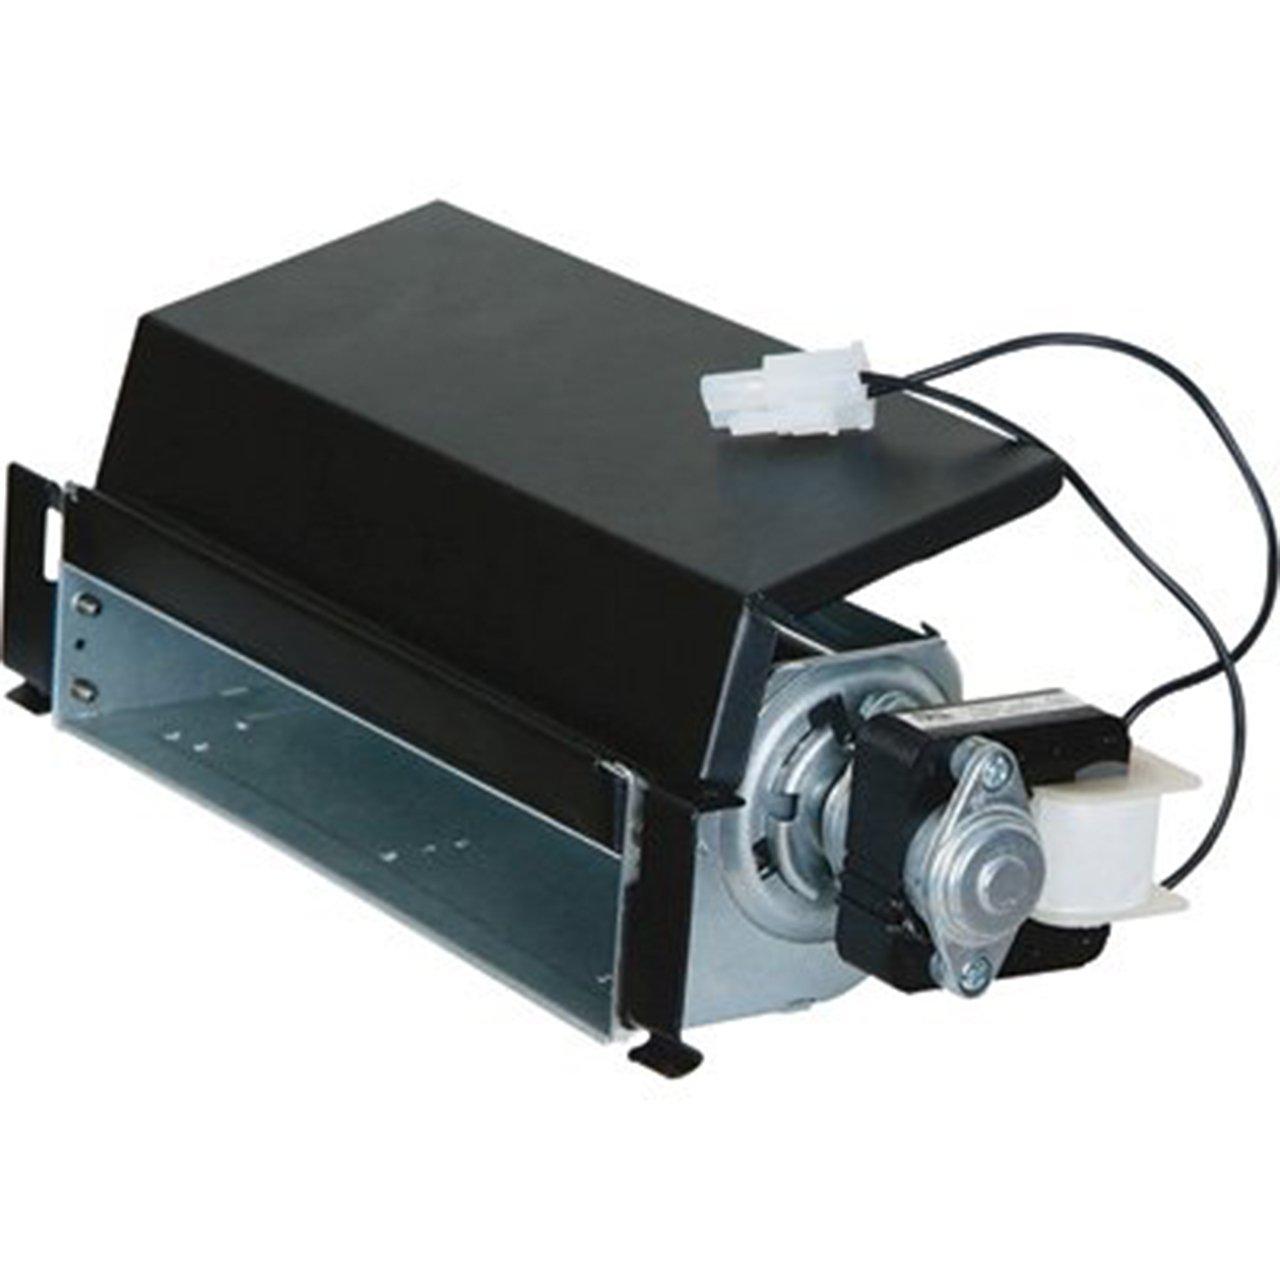 ProCom FIB100 Dual Fuel Fireplace Blower, Large, Black, Silver by ProCom